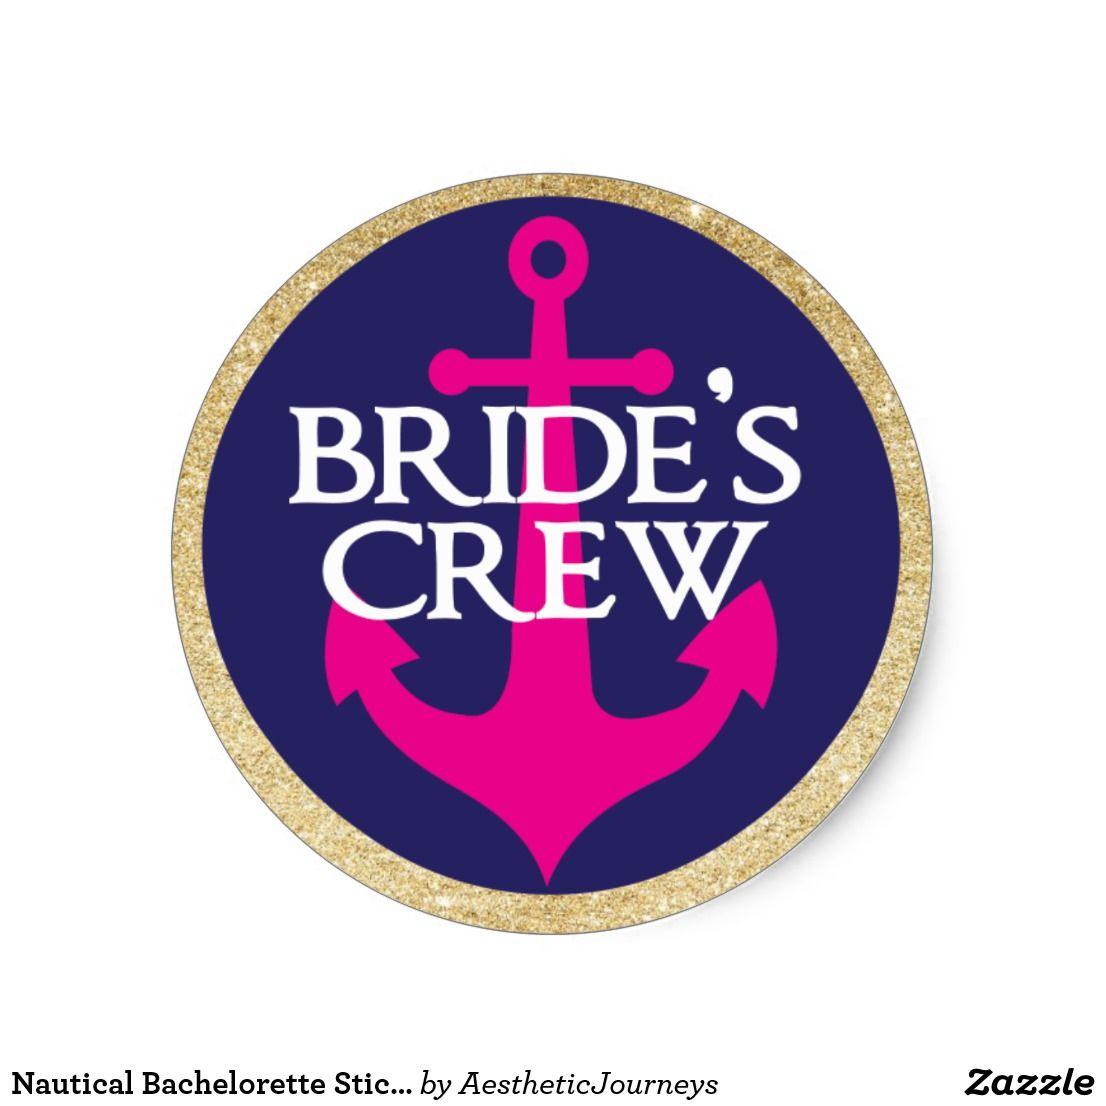 monogram wedding envelope seals sticker%0A Nautical Bachelorette Sticker Last Sail Classic Round Sticker  Nautical  BacheloretteRound Stickers